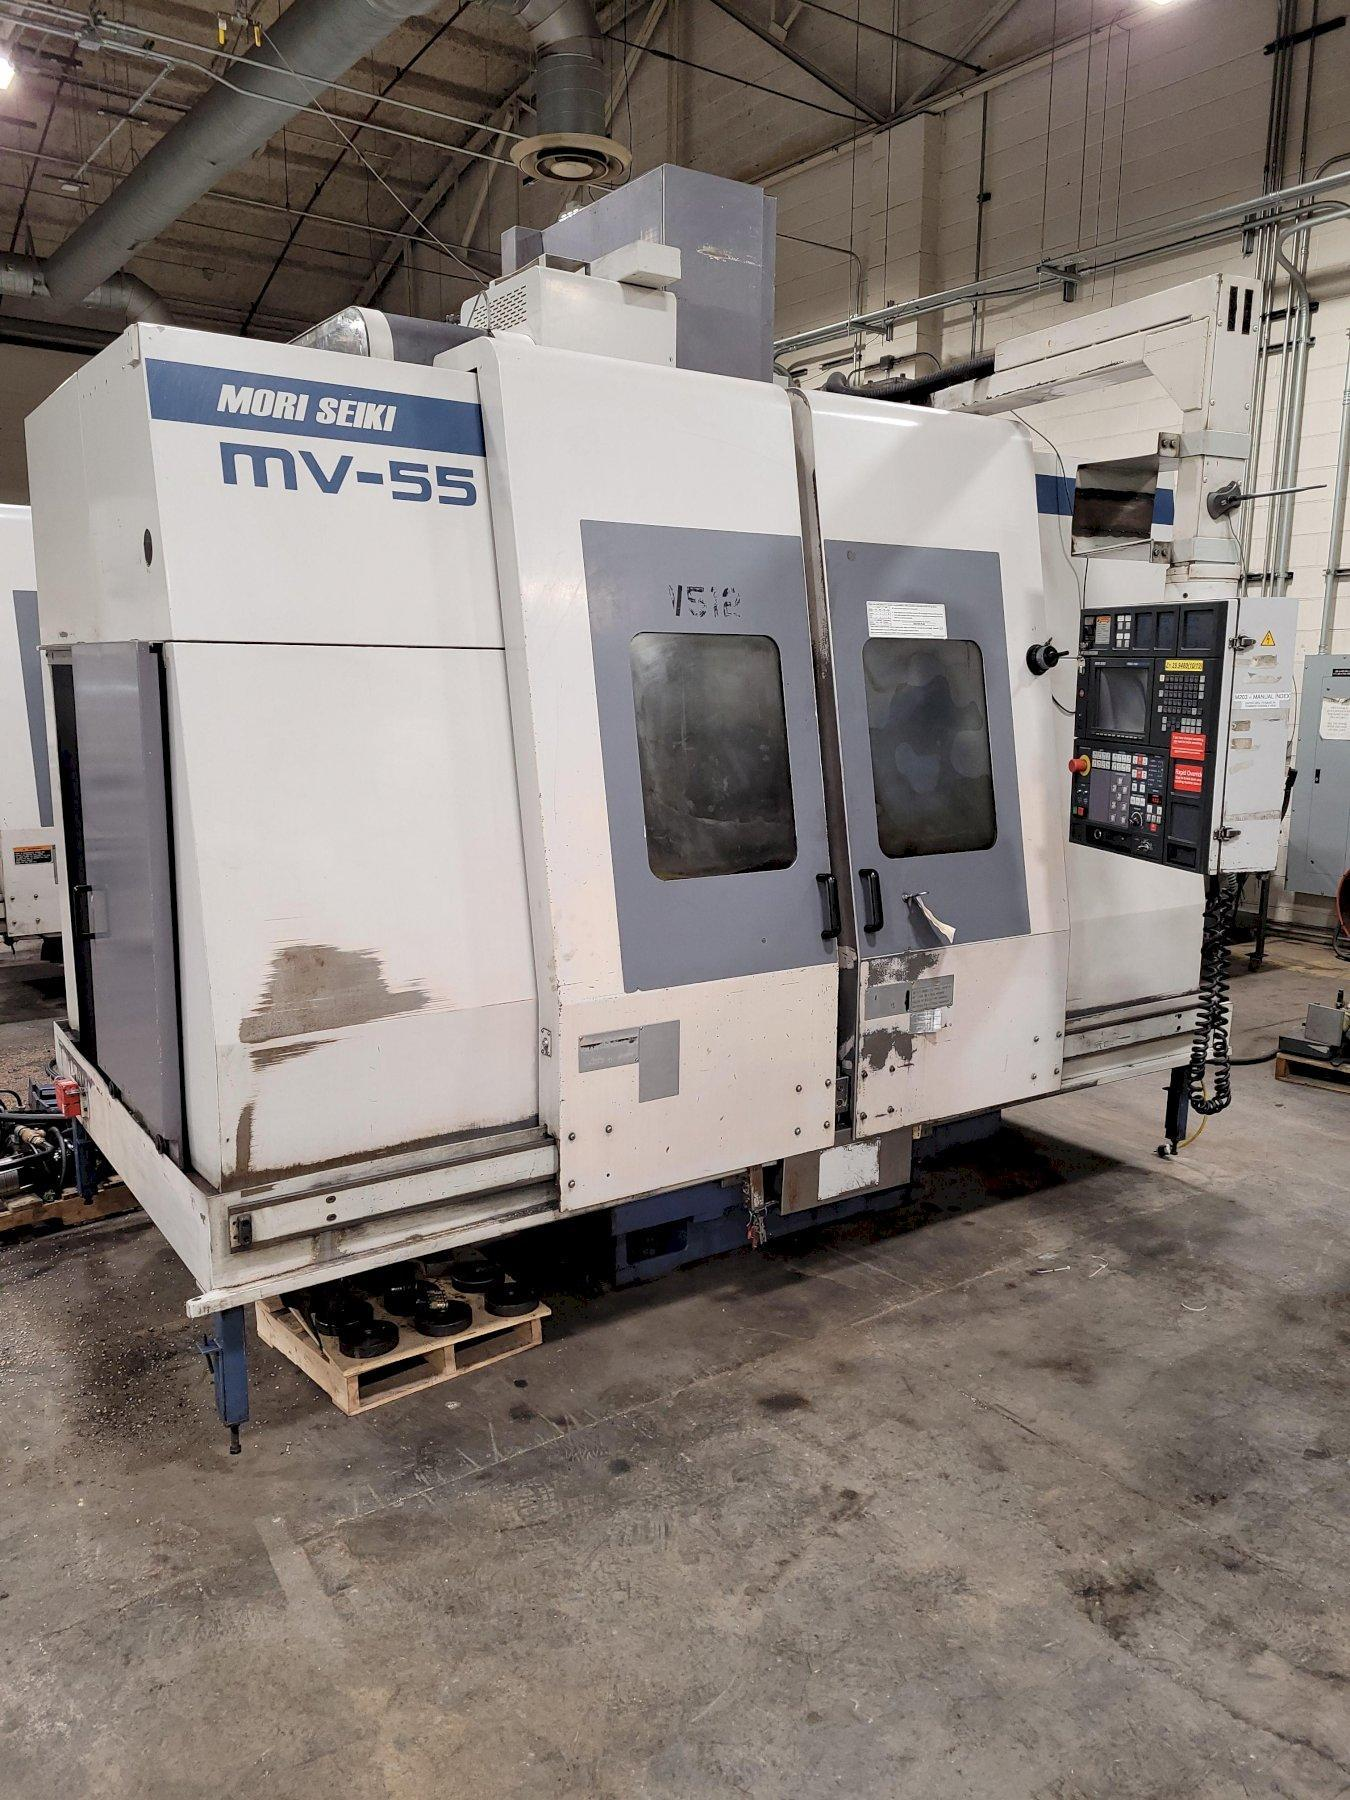 Mori Seiki MV-55/50 CNC Vertical Machining Center